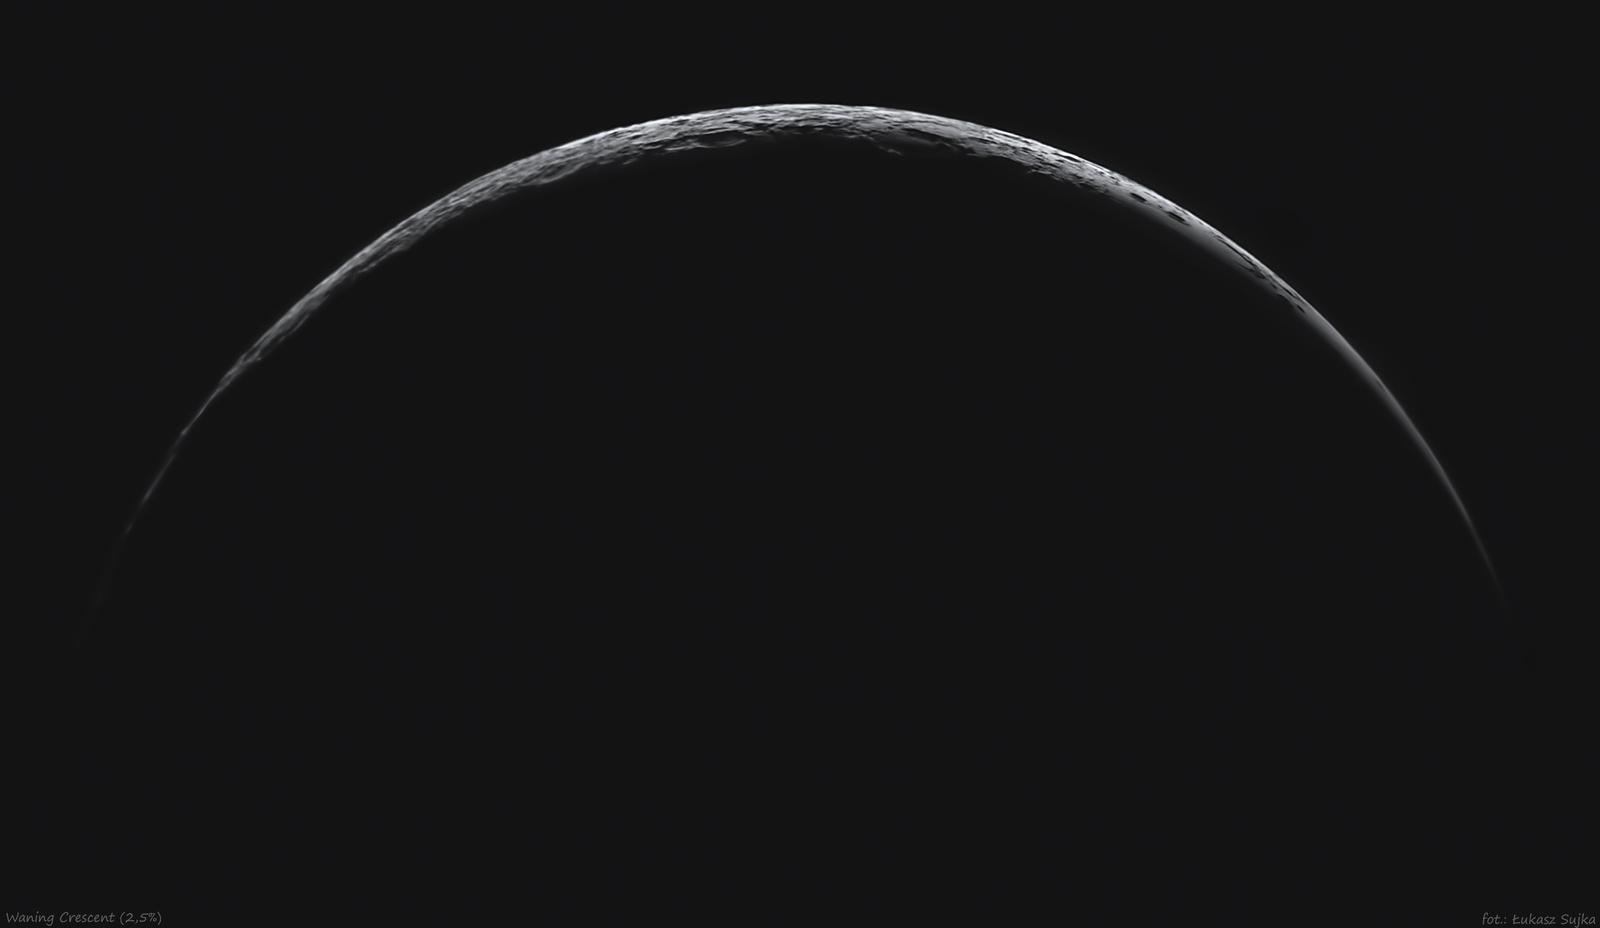 1238687529_Moon2_5fullv2.thumb.jpg.1b20ed4a4c51fd2d67c0306063fd43d8.jpg